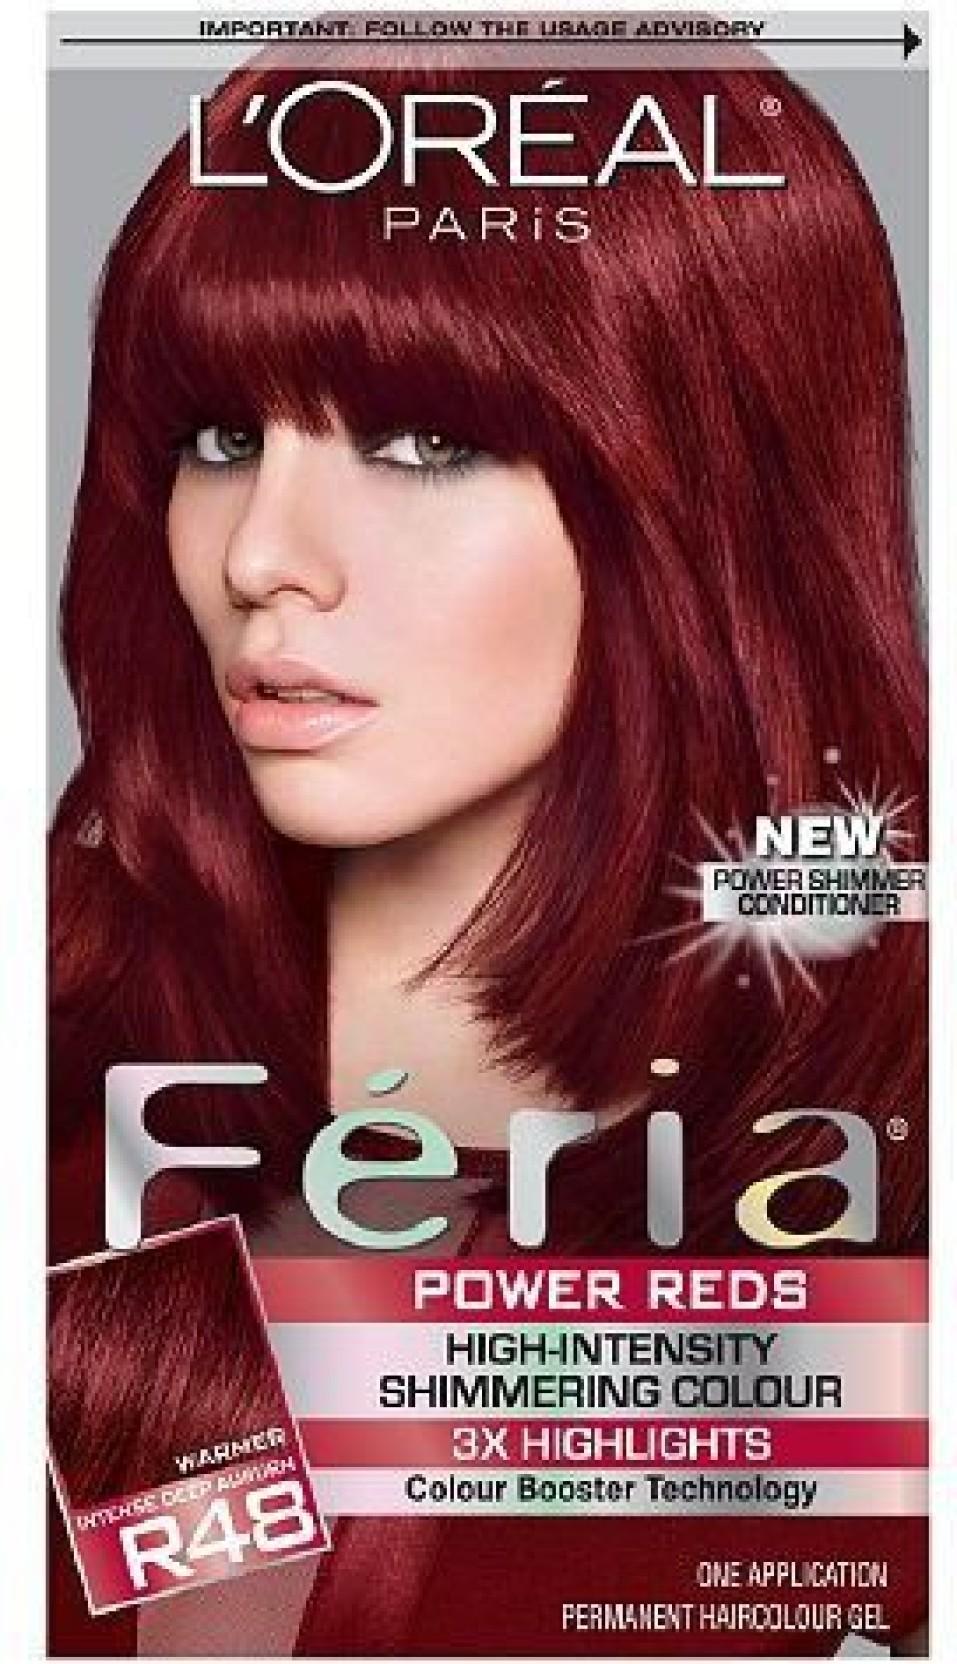 Loreal Paris Paris Feria Power Reds Haircolor Hair Color Price In